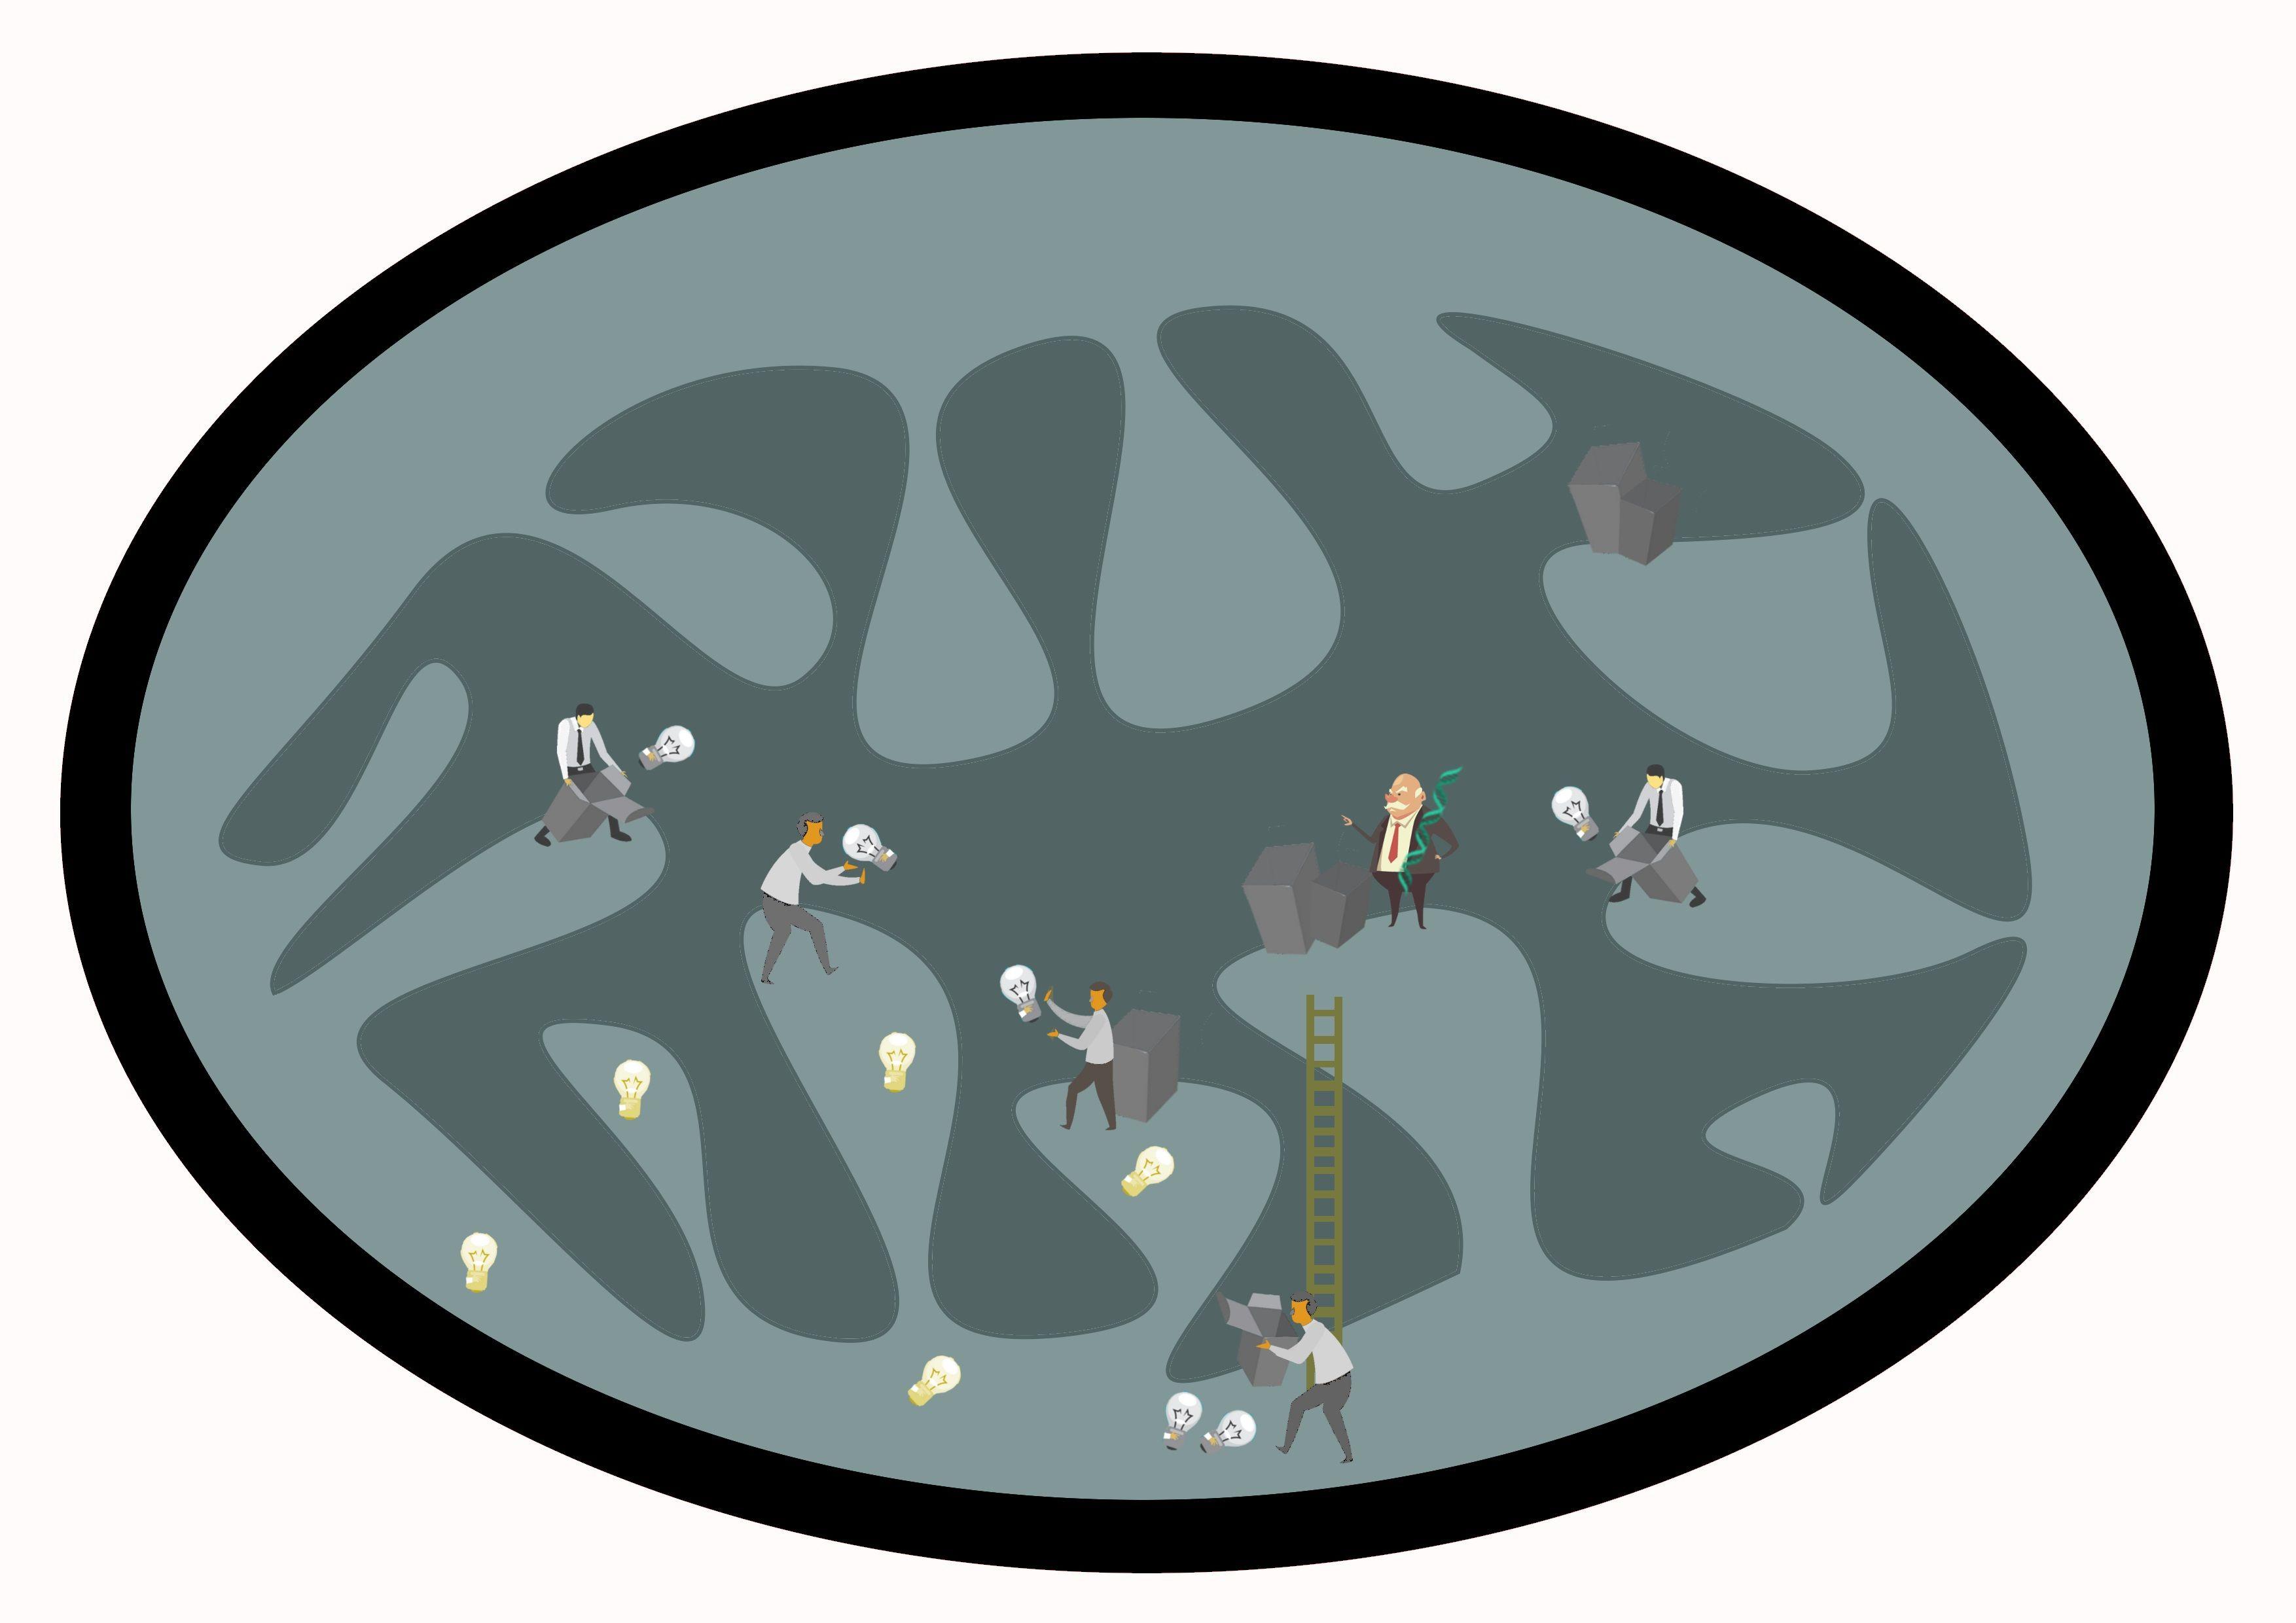 ADN mitocondria